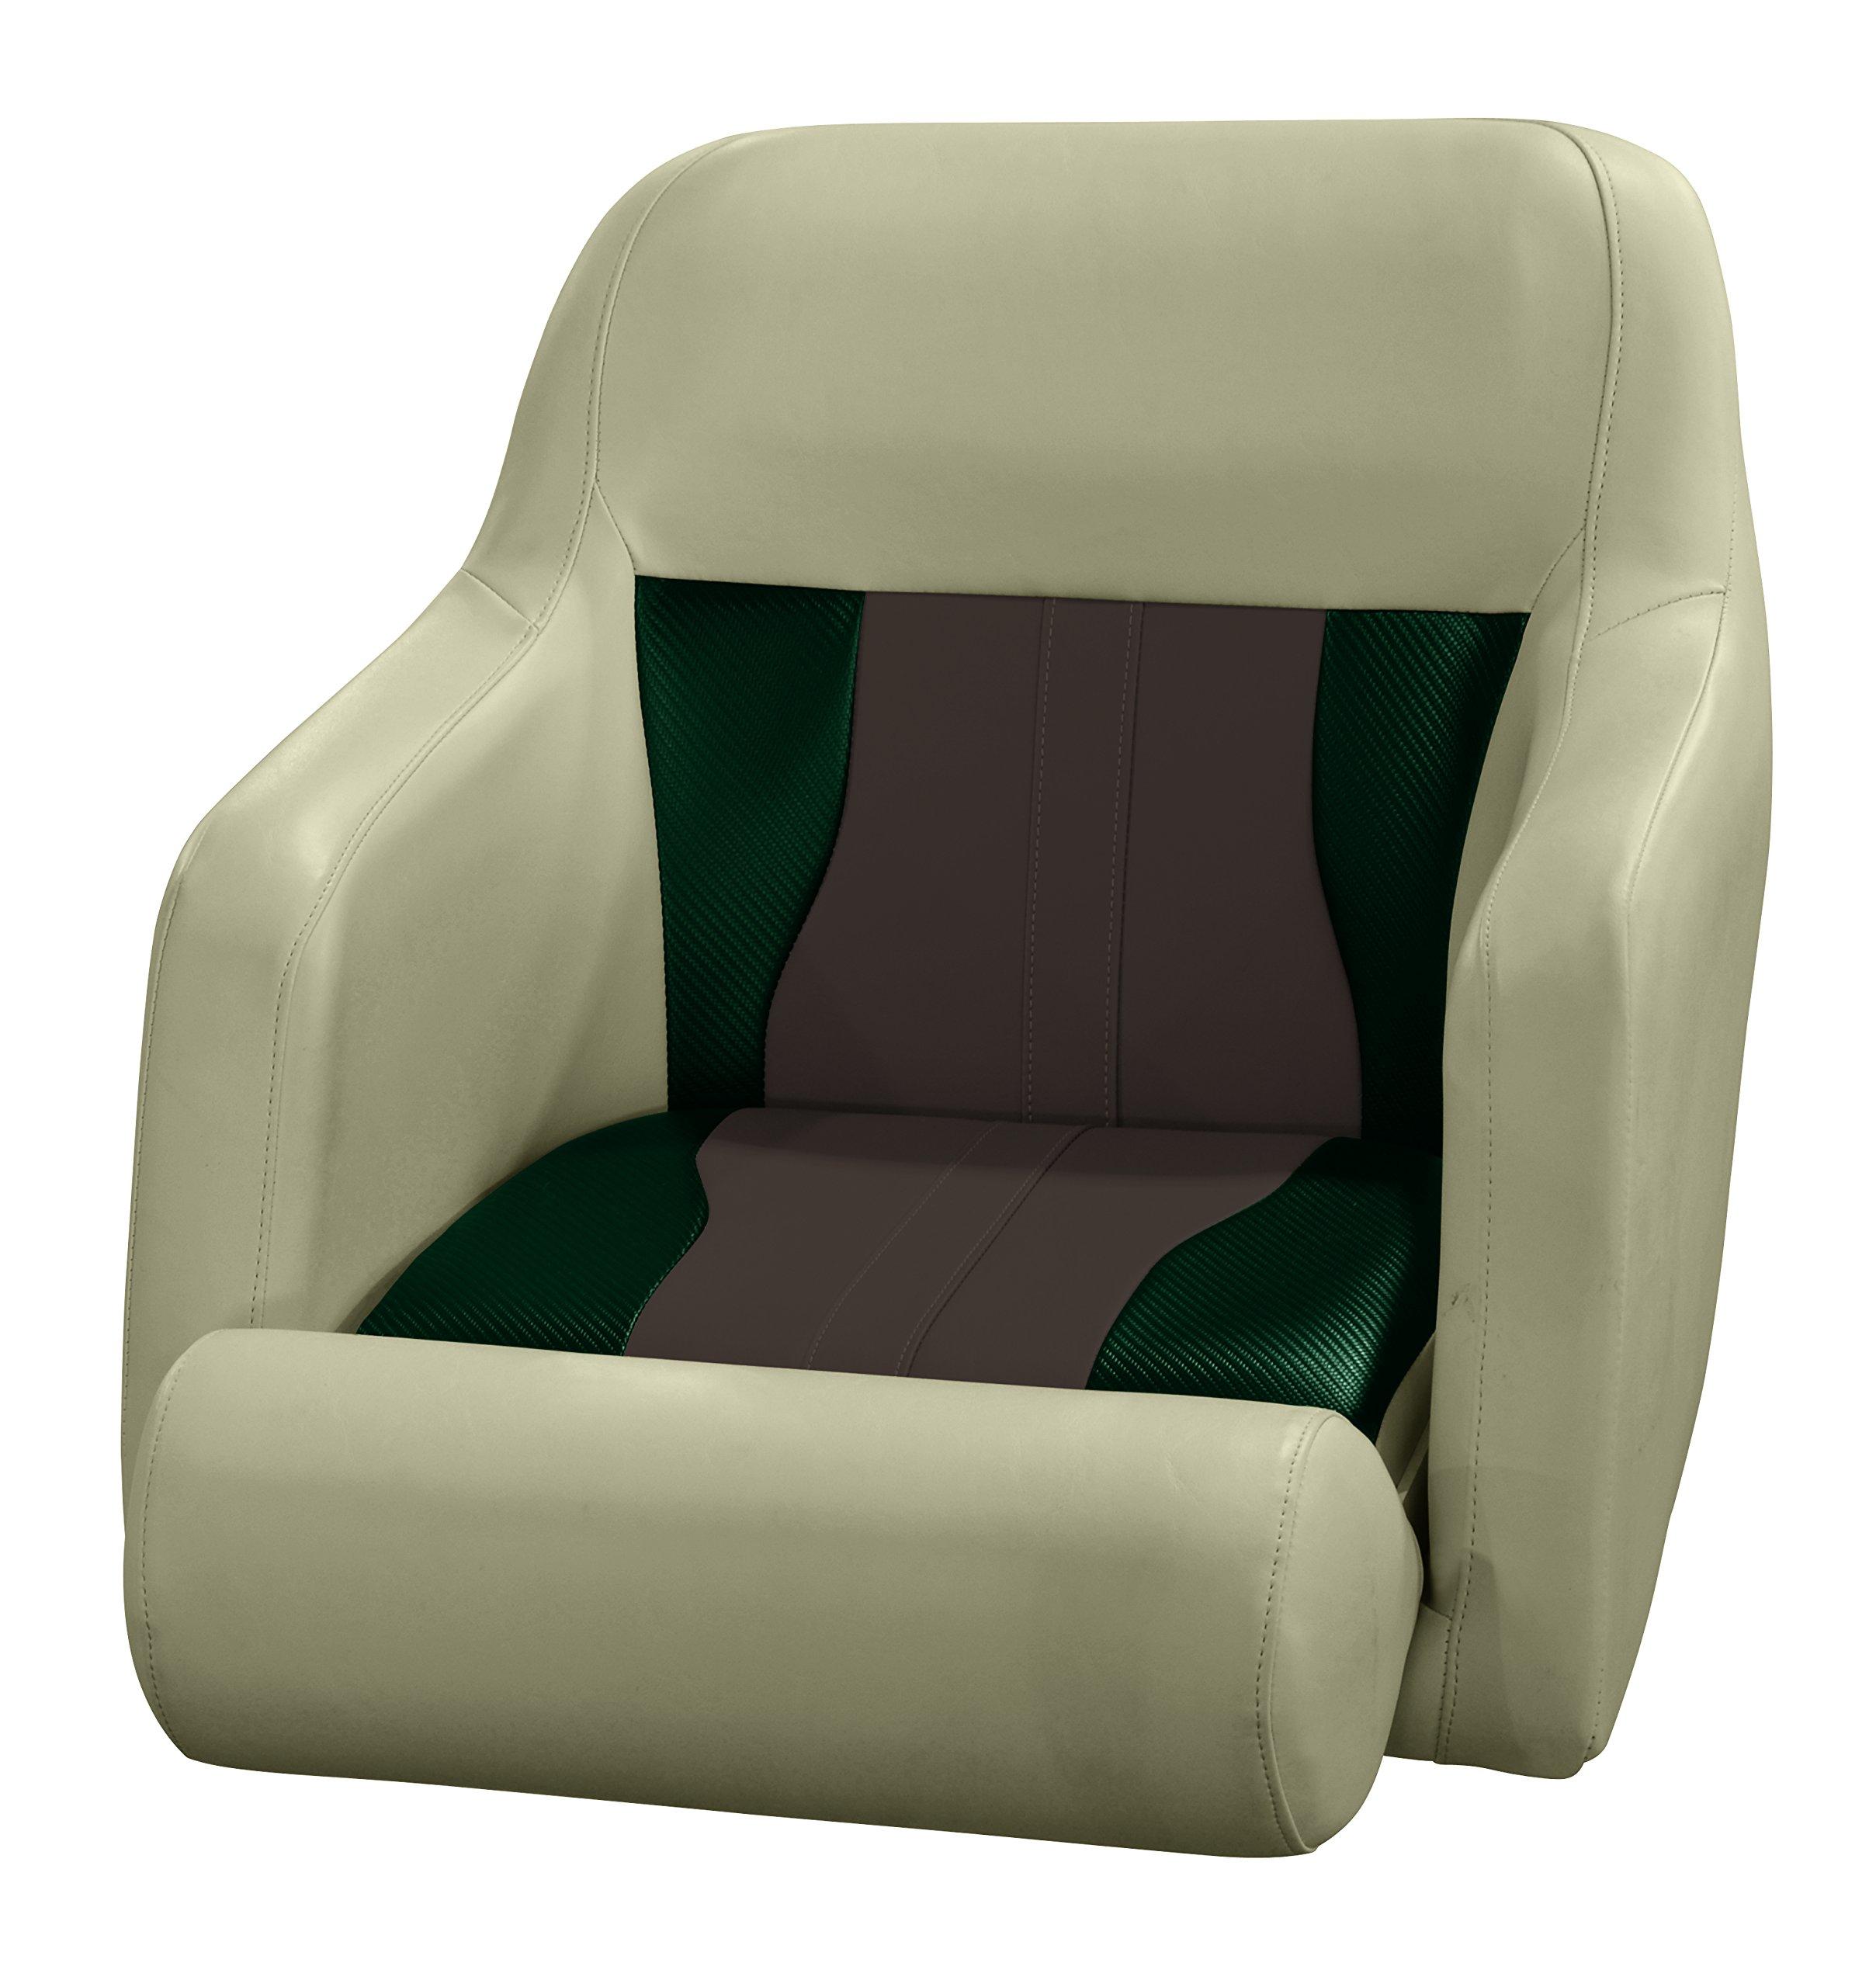 Wise 3012-1807 Mocha Java, Rock Salt, Evergreen Carbon Fiber Talon Bolster Bucket Helm Seat, Mocha Java-Rock Salt-Evergreen Carbon by Wise